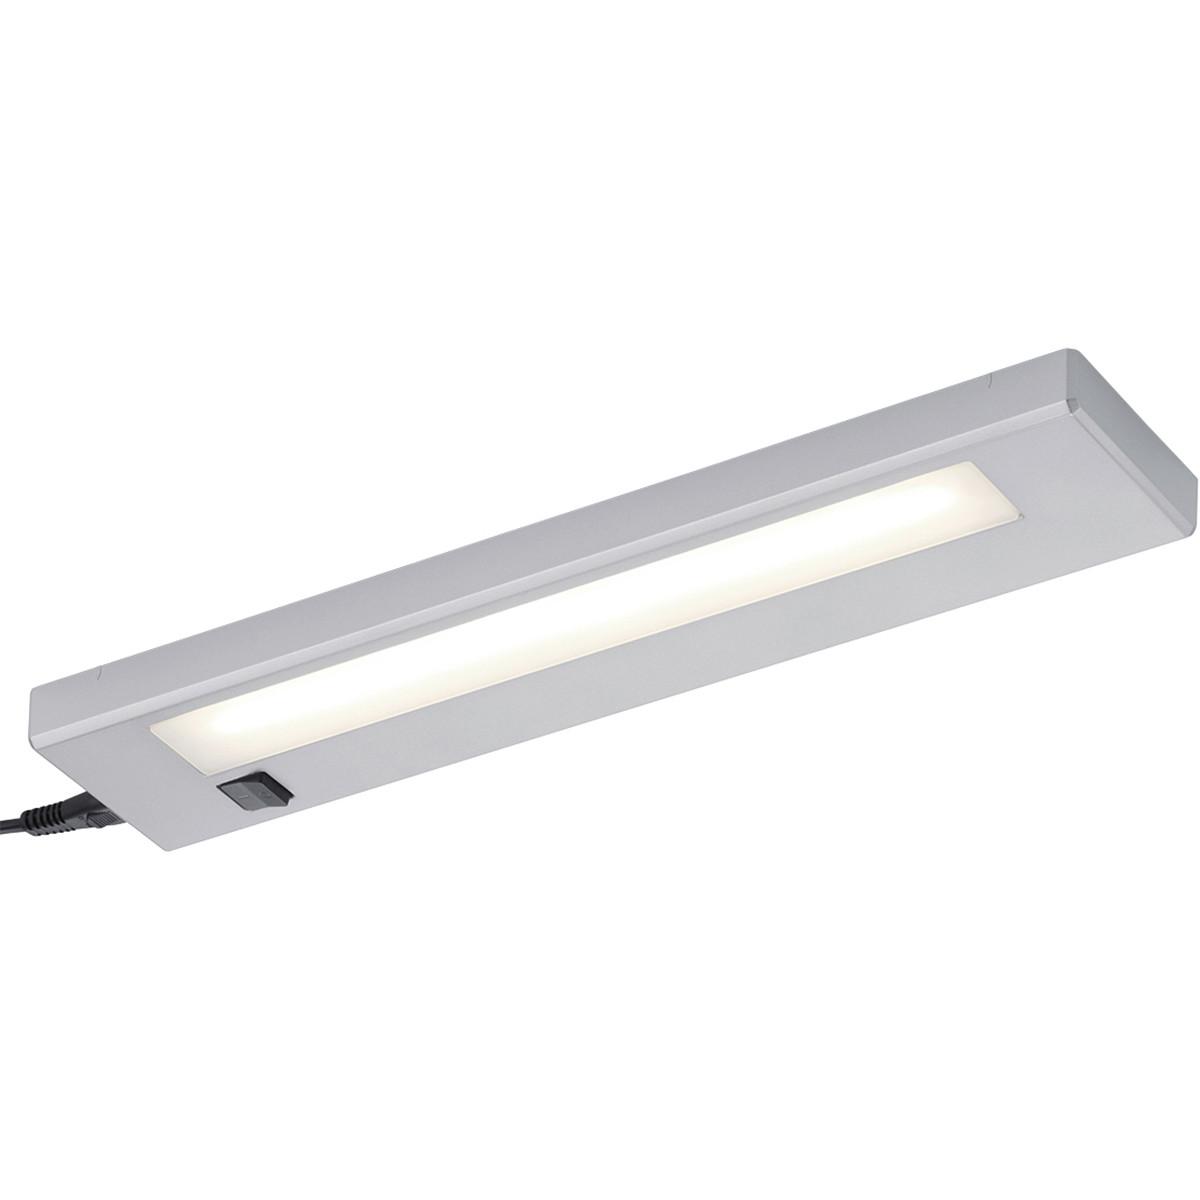 LED Wandlamp Trion Alyna 4W Warm Wit 3000K Rechthoek Mat Titaan